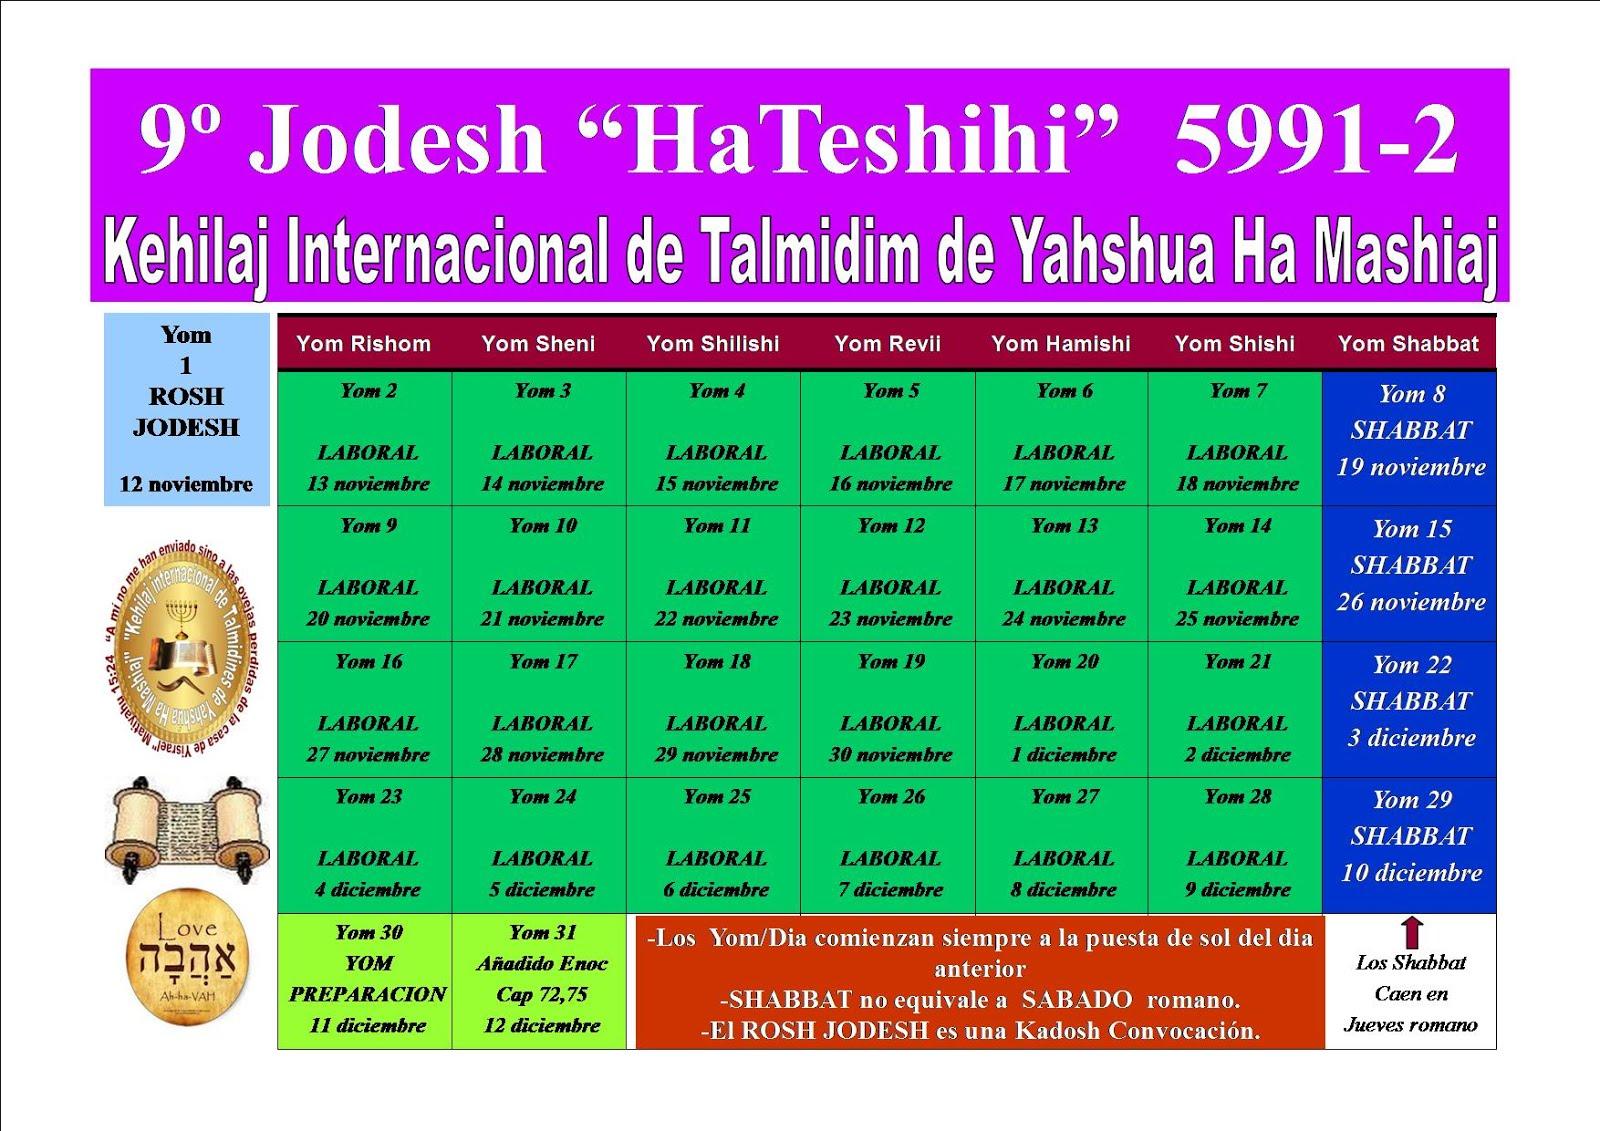 CALENDARIO DEL 9º JODESH